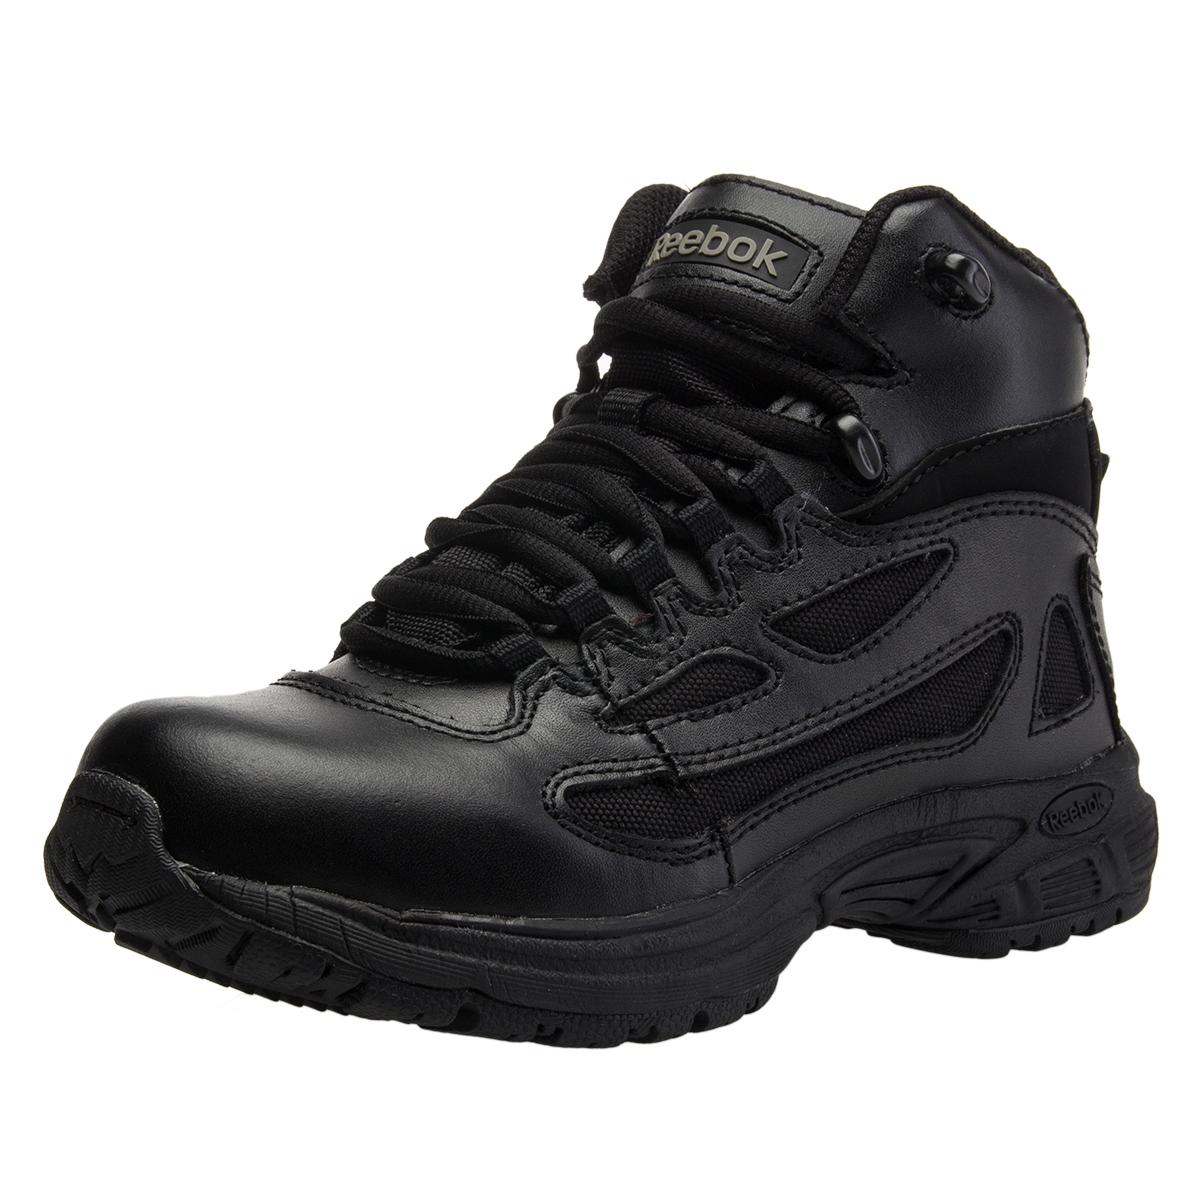 Reebok Women Rapid Response 4 Tactical Boots Soft Toe Sho...